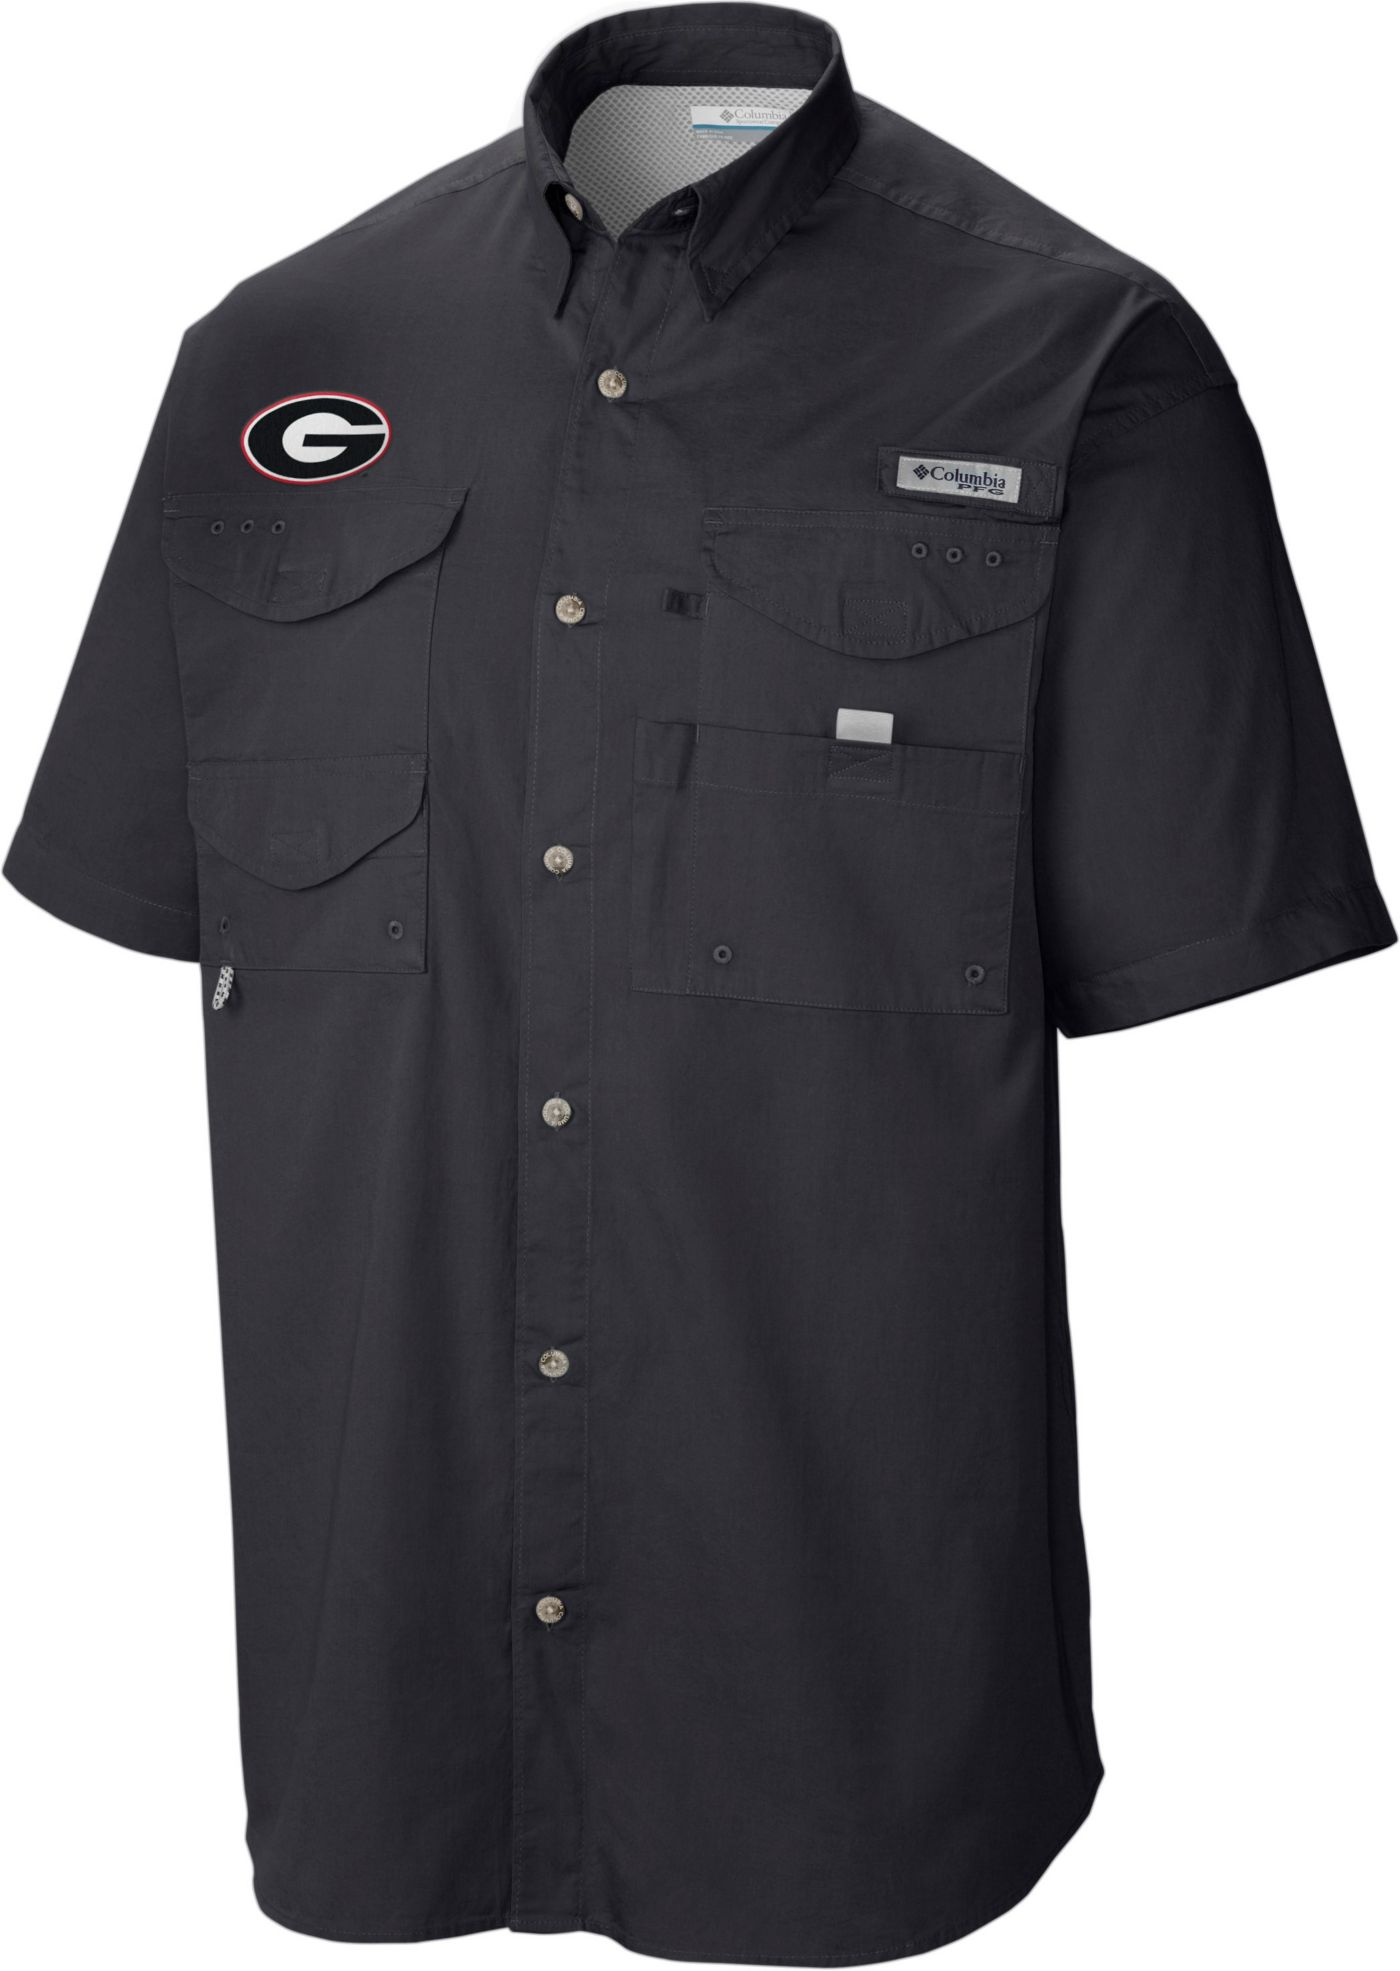 Columbia Men's Georgia Bulldogs Tamiami Performance Black Shirt